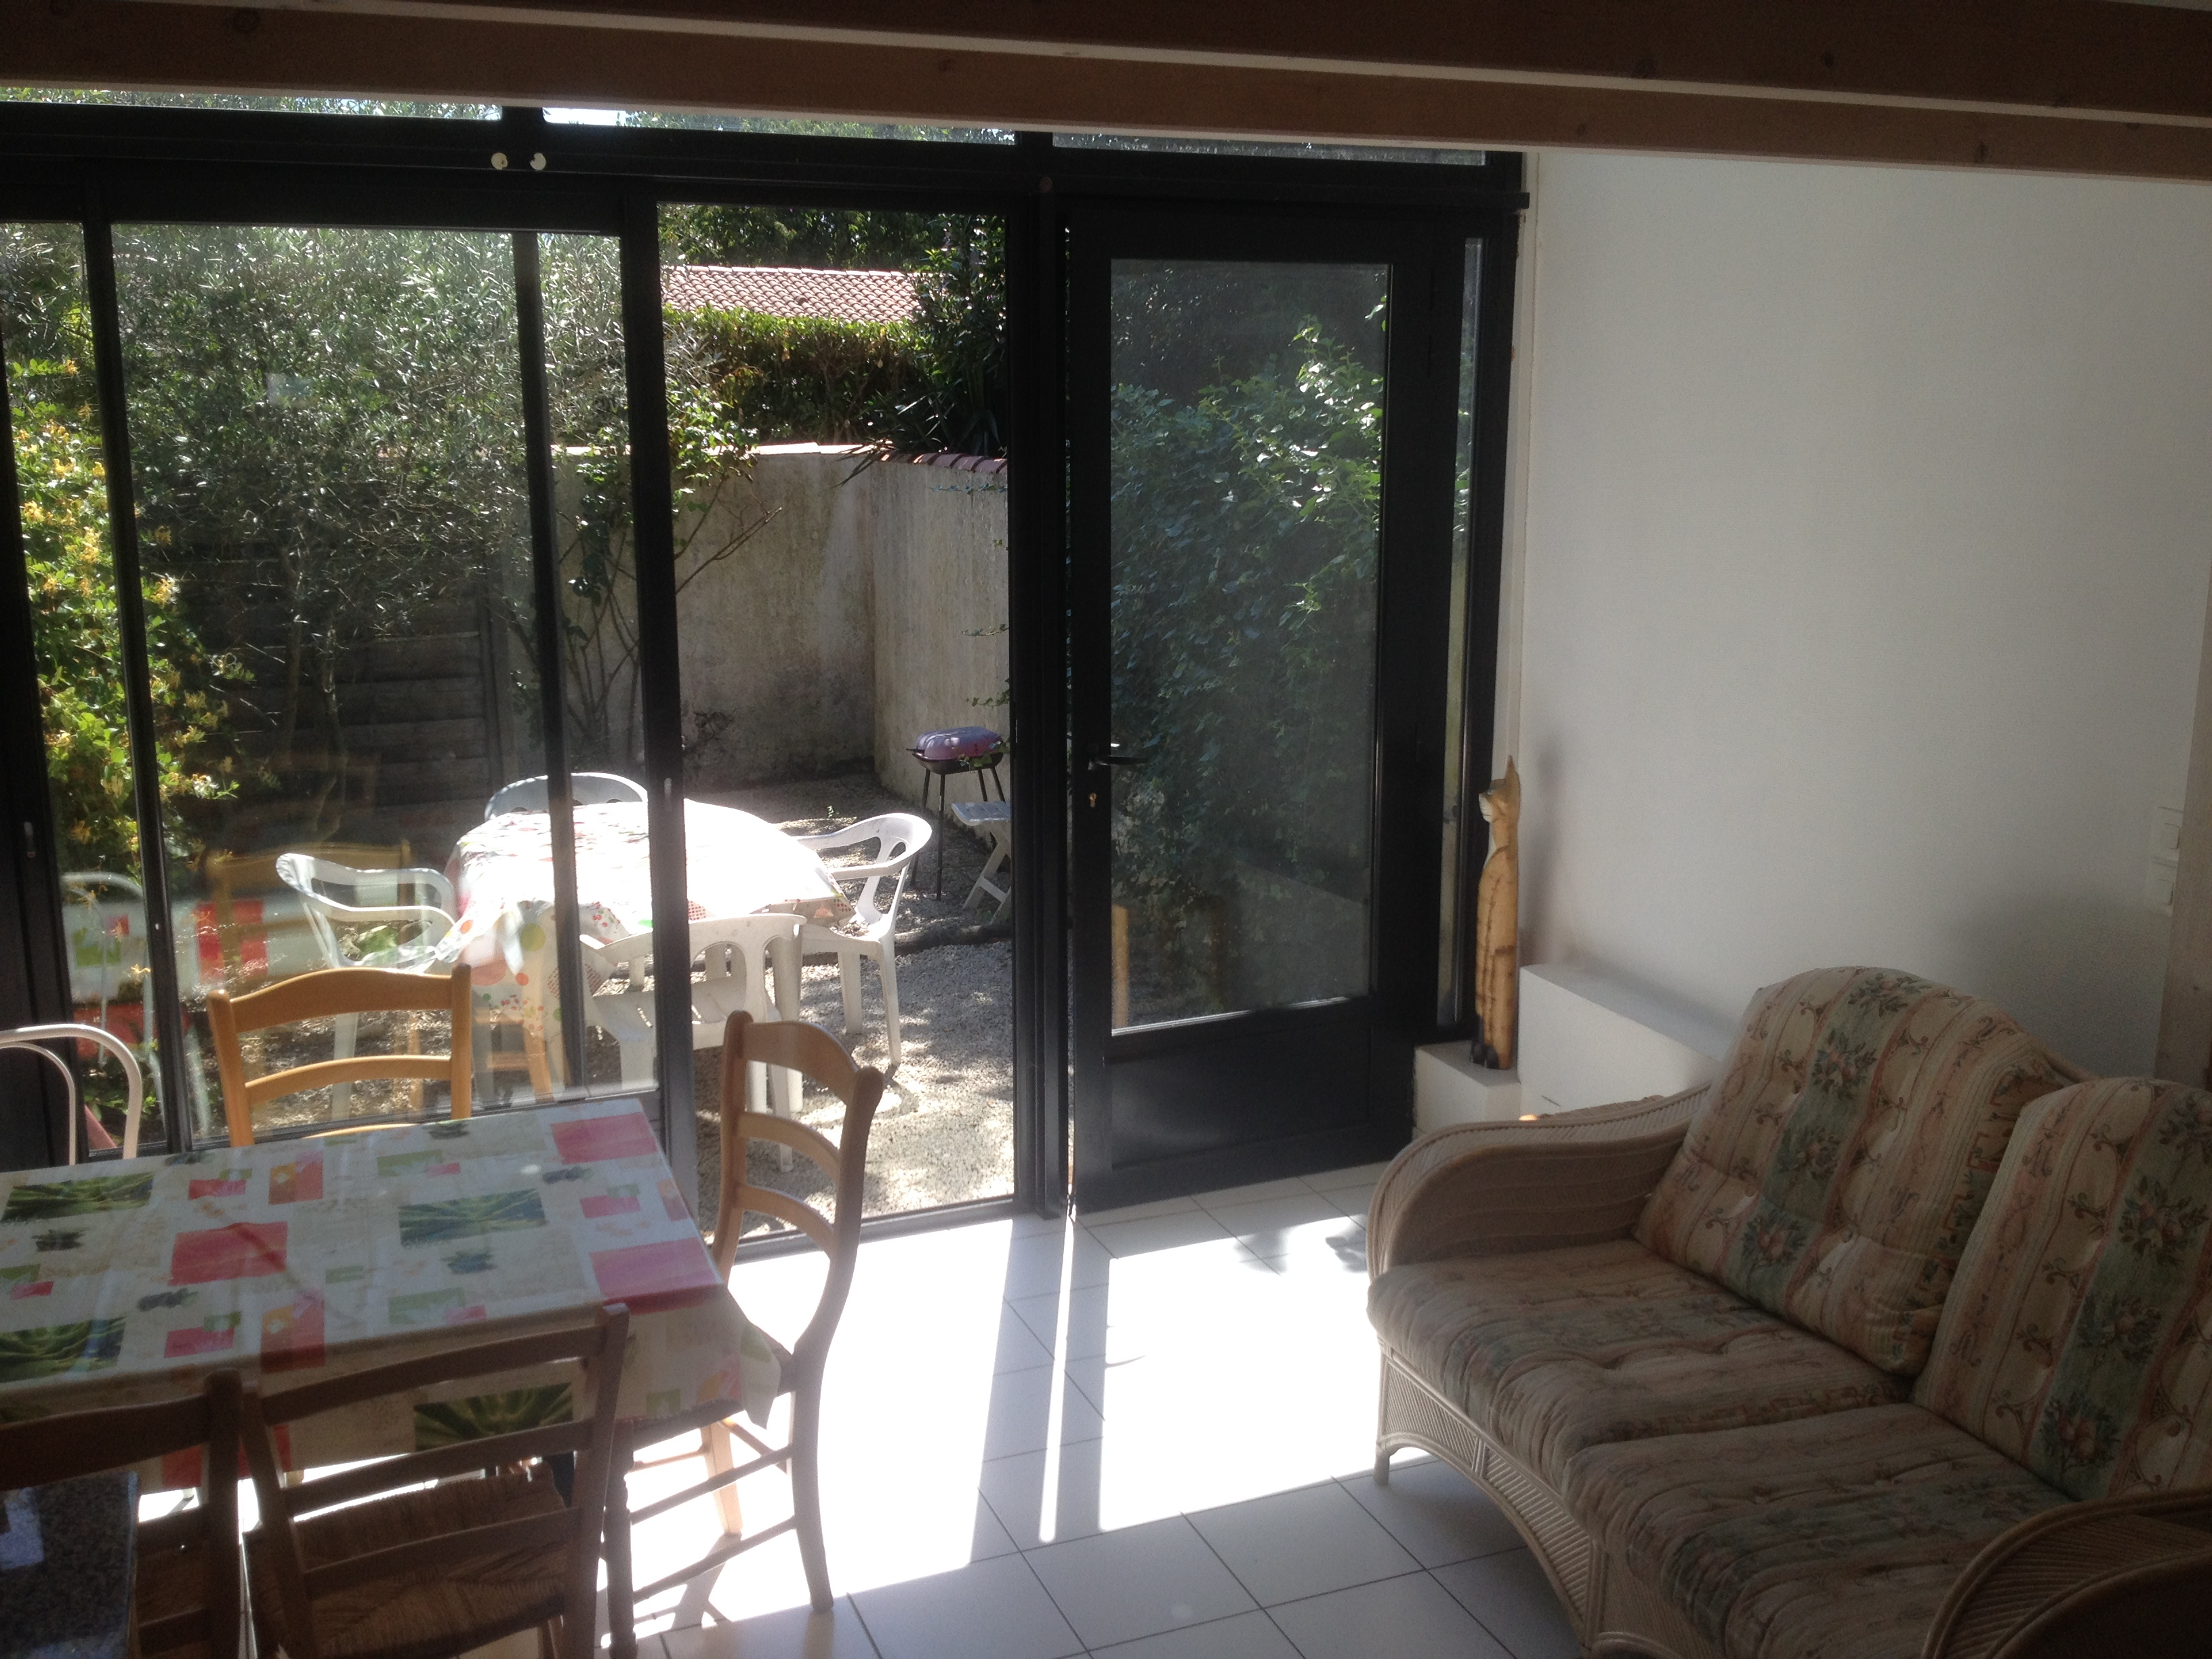 maison loft 1 t3 55 m2 loft gauche la rochelle location meubl e la rochelle 1km. Black Bedroom Furniture Sets. Home Design Ideas